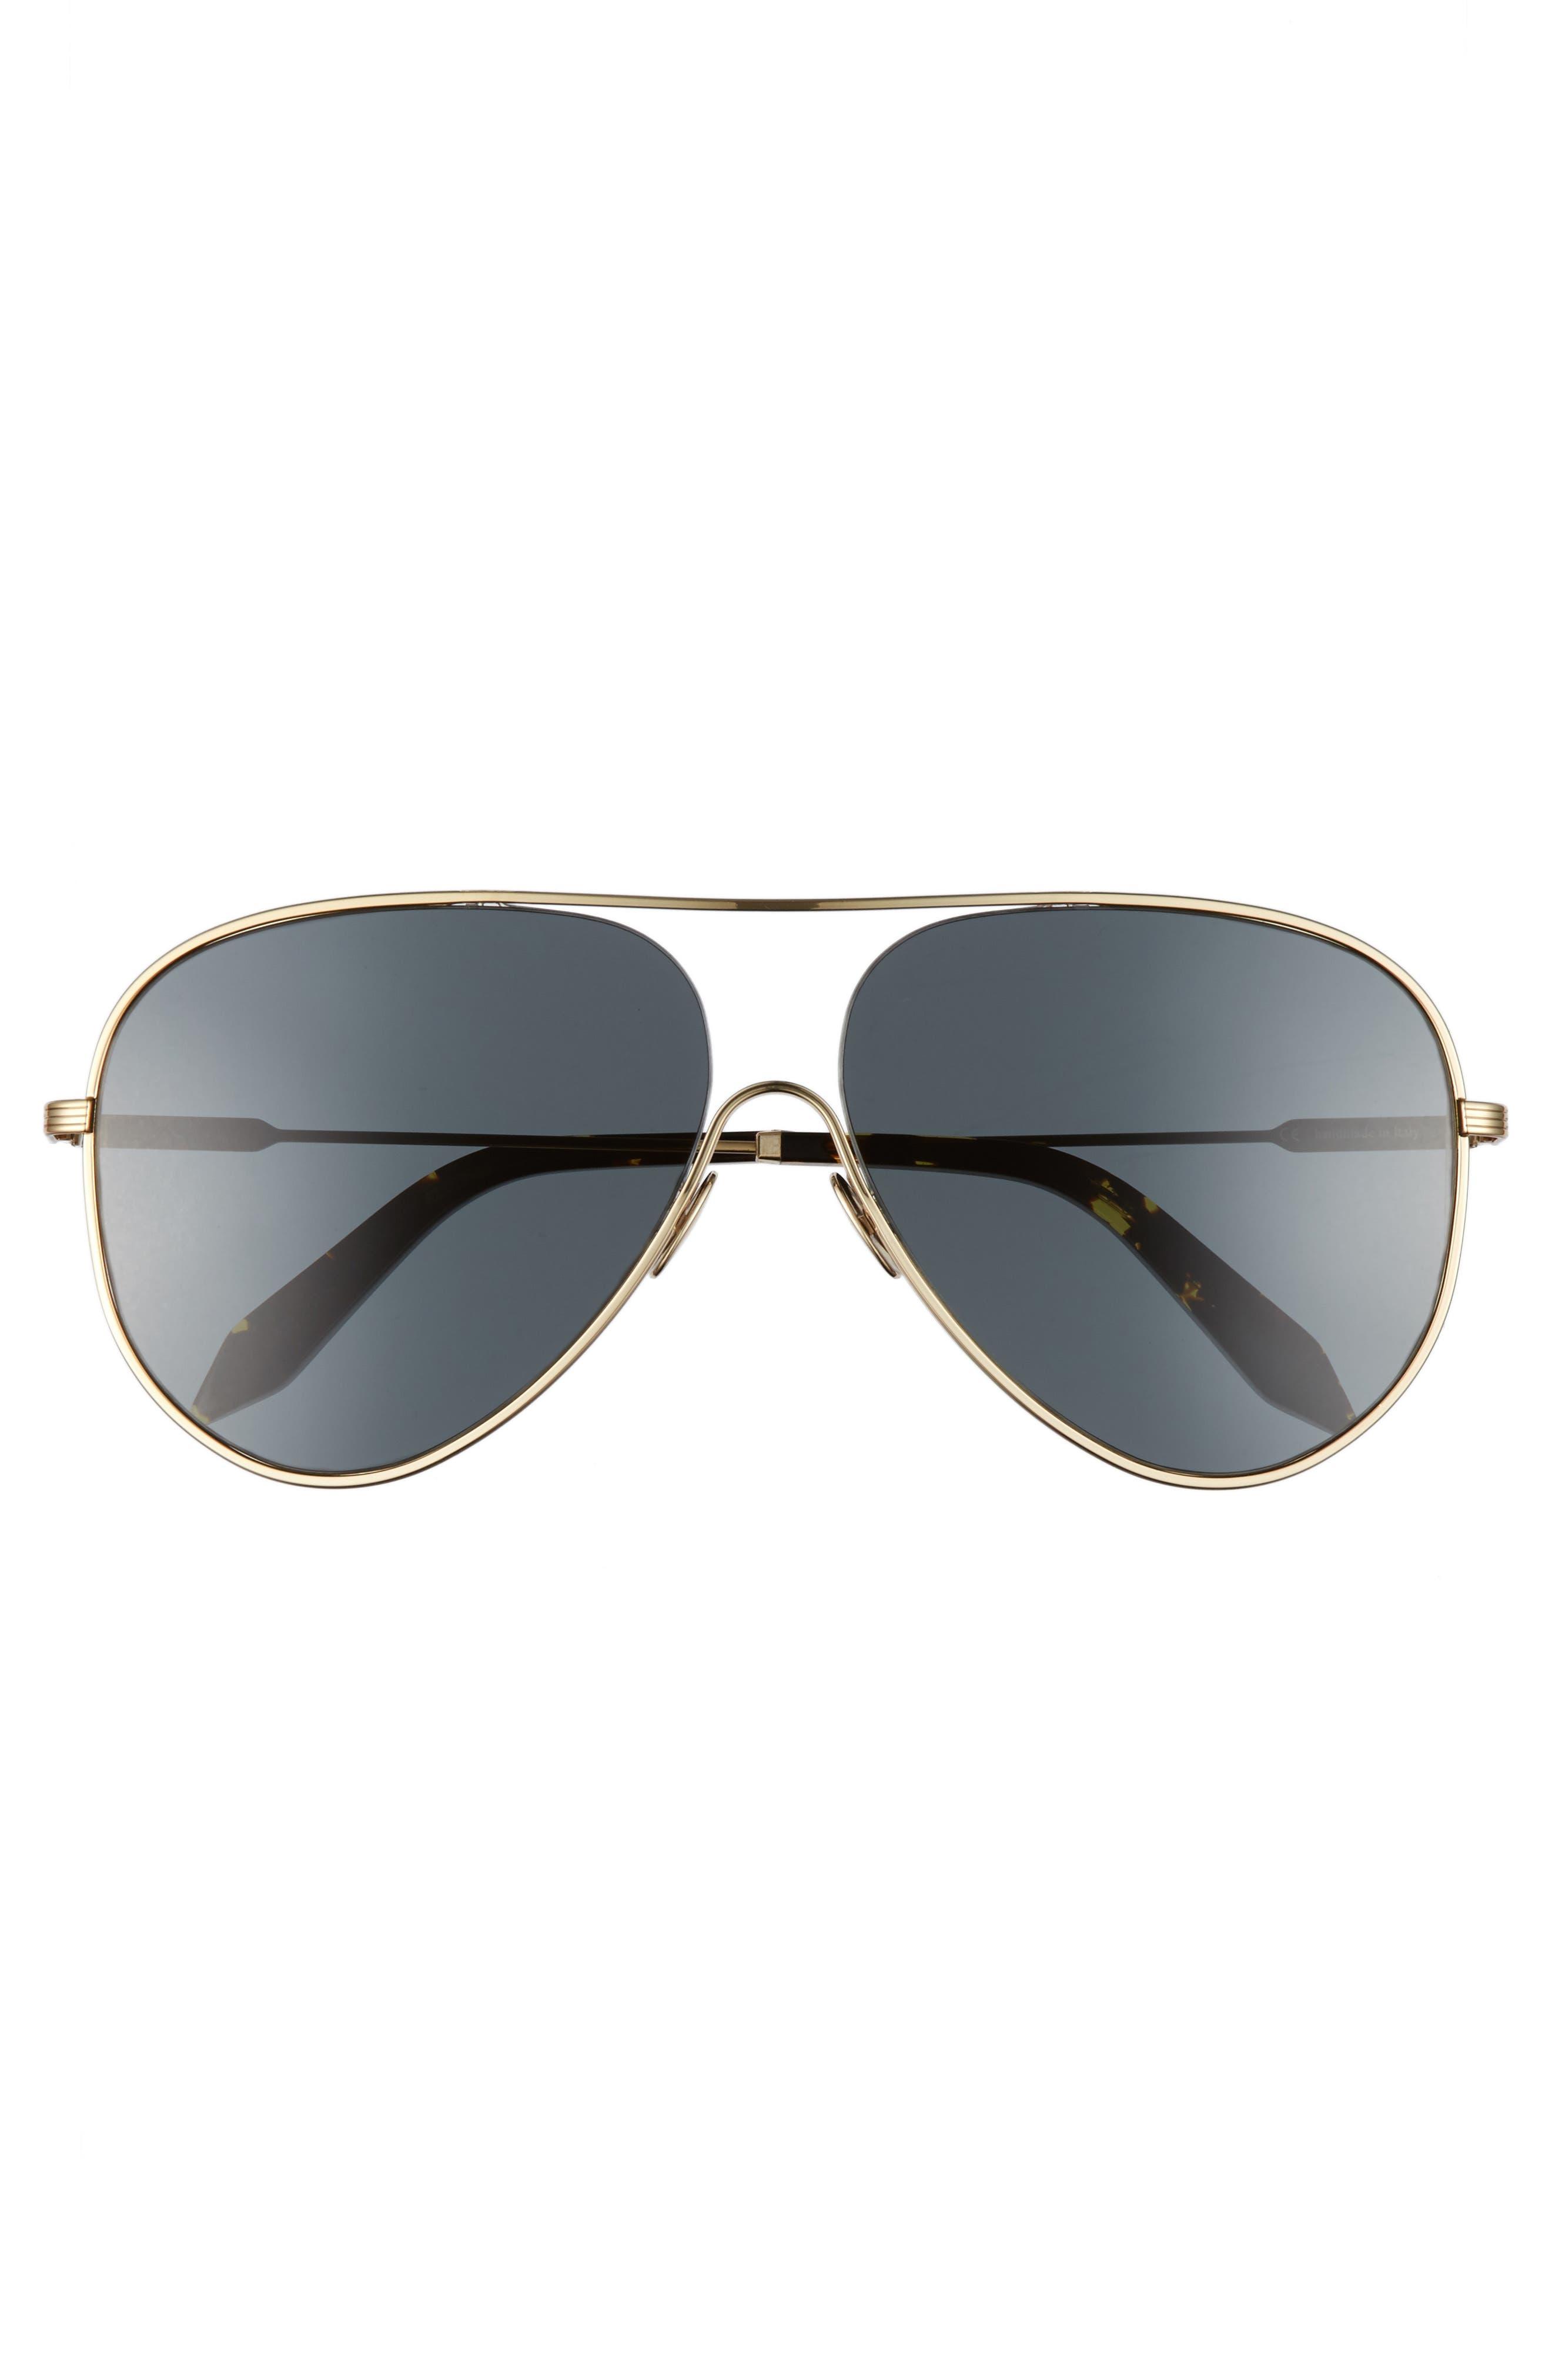 VICTORIA BECKHAM, Loop 62mm Oversize Aviator Sunglasses, Alternate thumbnail 3, color, 020